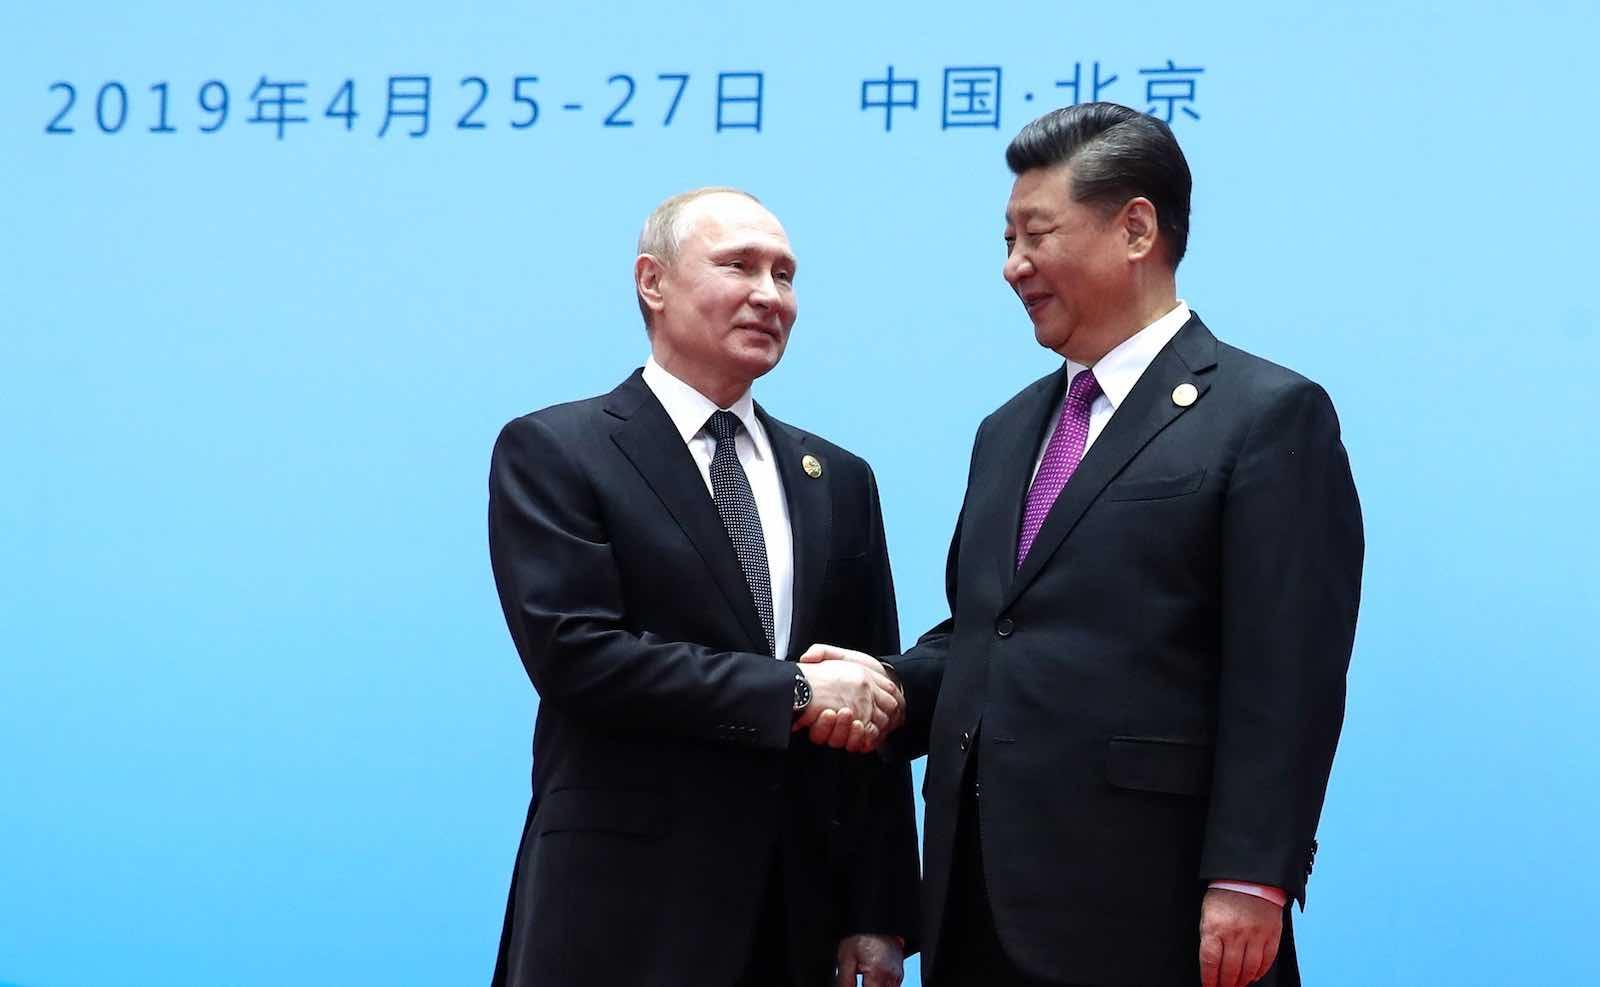 Russia's Vladimir Putin and China's Xi Jinping (Kremlin.ru)